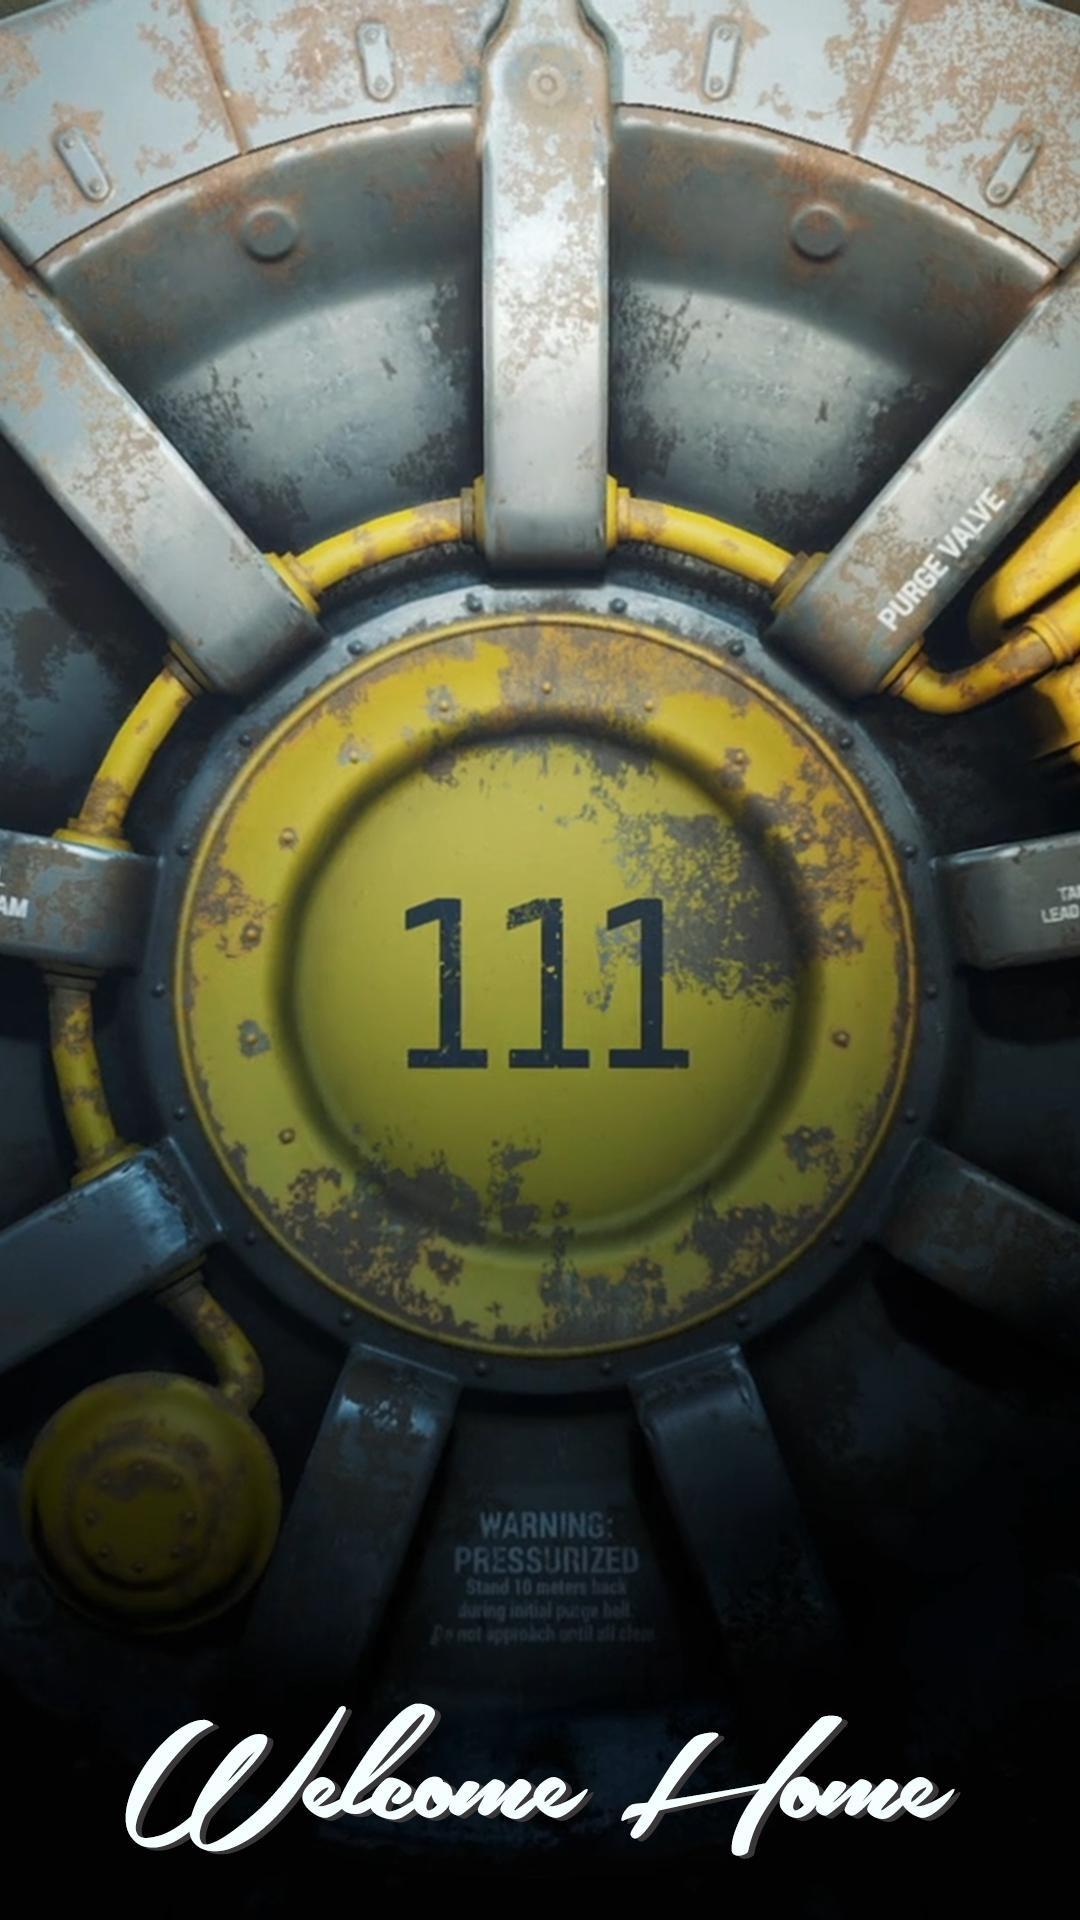 artwork Video Games Fallout New Vegas Wallpapers HD Desktop   HD Wallpapers    Pinterest   Fallout, Wallpaper and Artwork